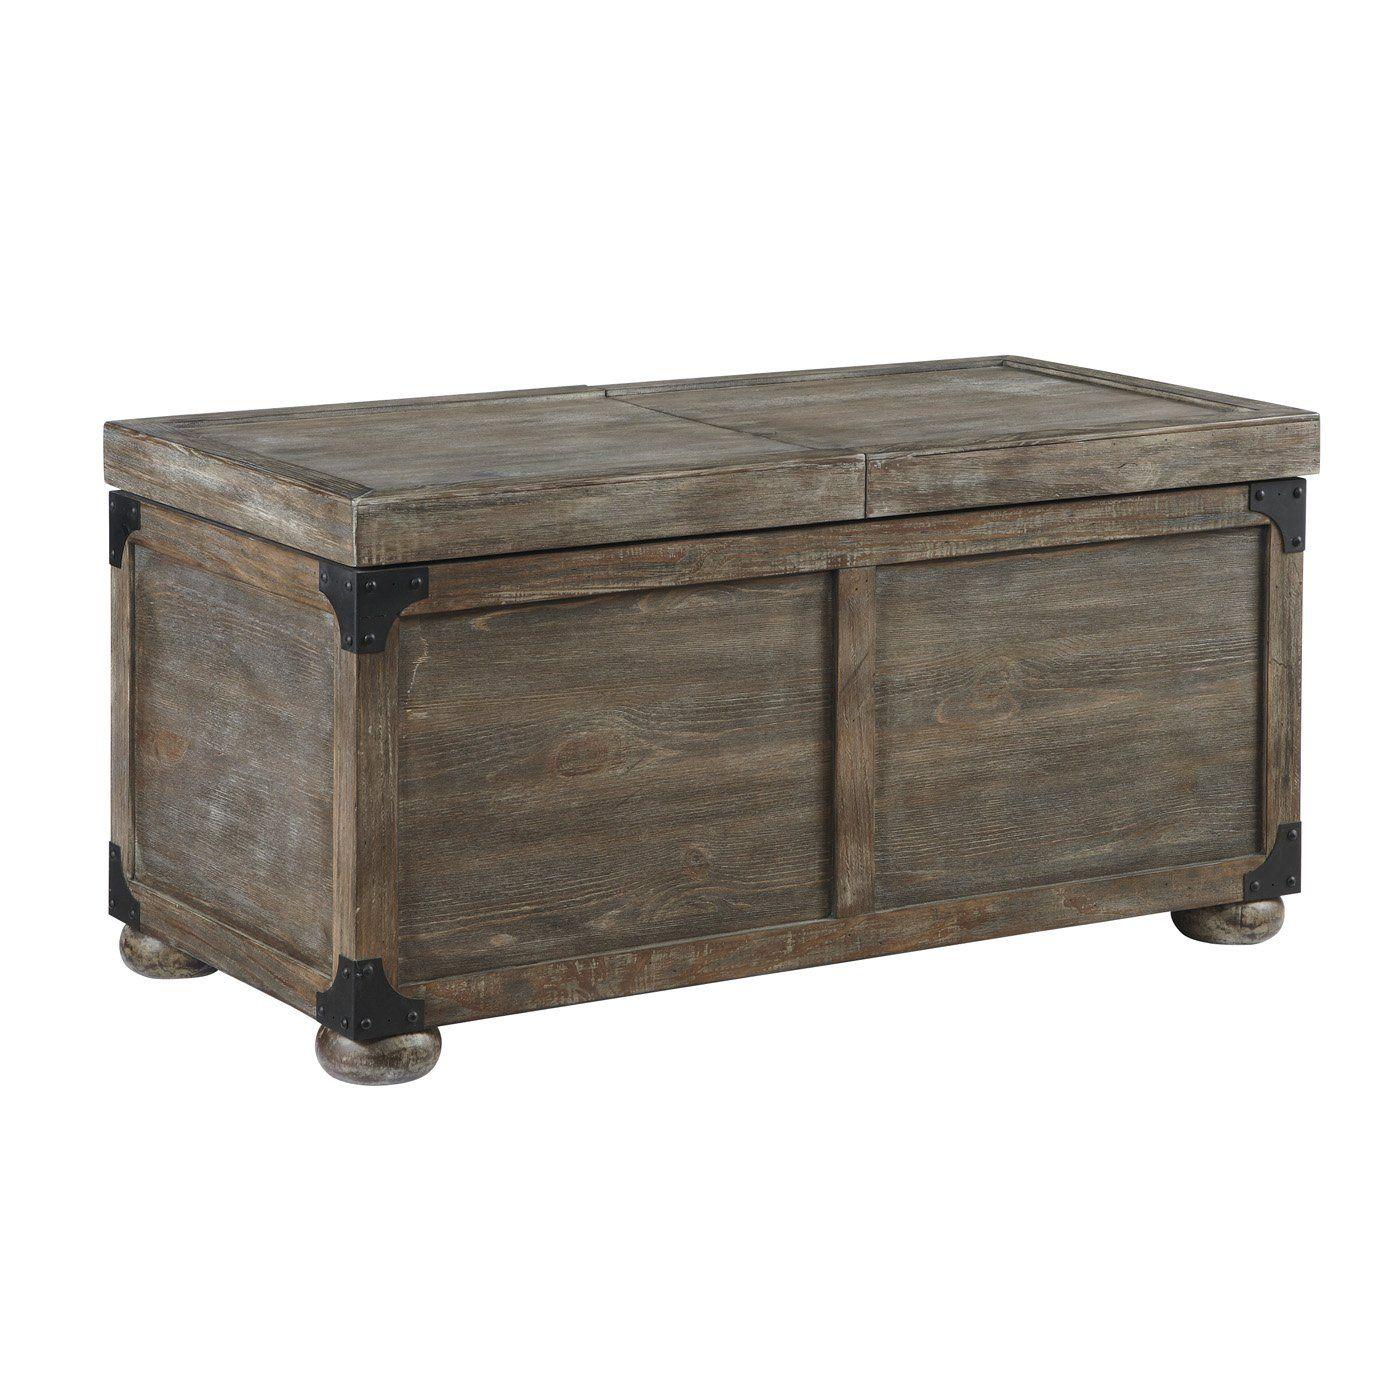 Ashley furniture T500 720